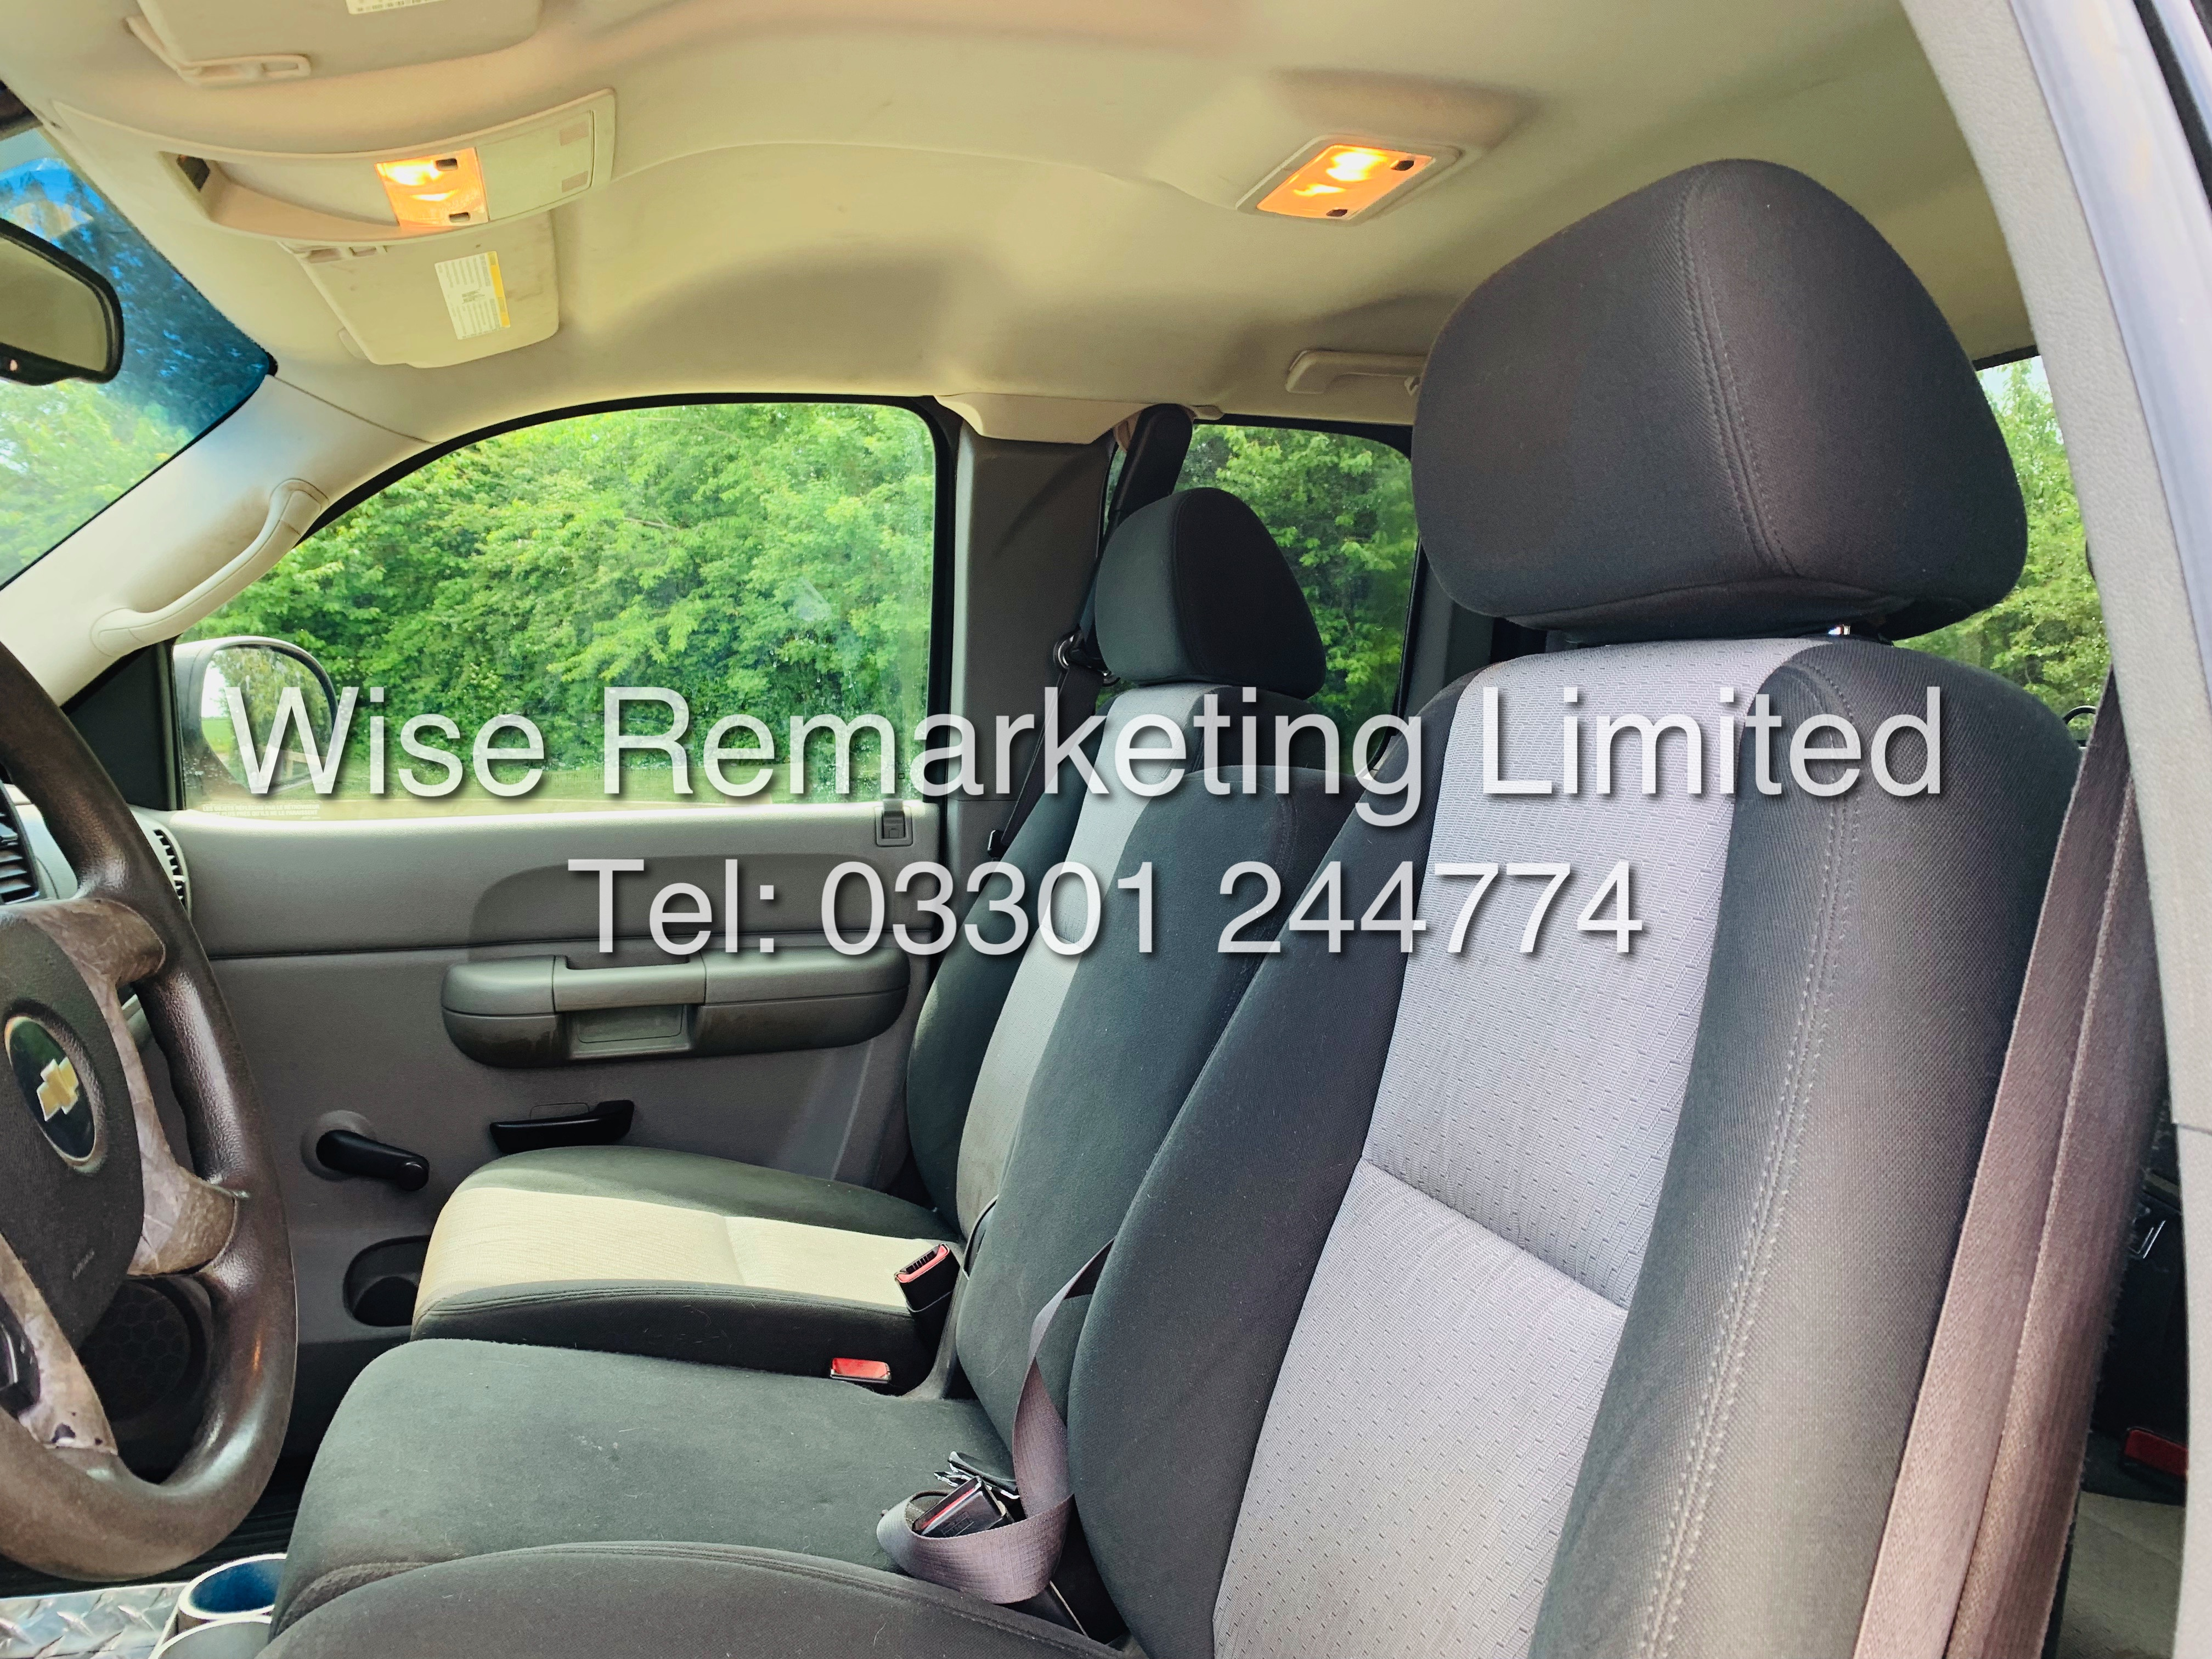 CHEVROLET SILVERADO 4.8L V8 LT1 KING-CAB 4X4**2007**FRESH IMPORT**IN METALLIC BLACK** - Image 12 of 22